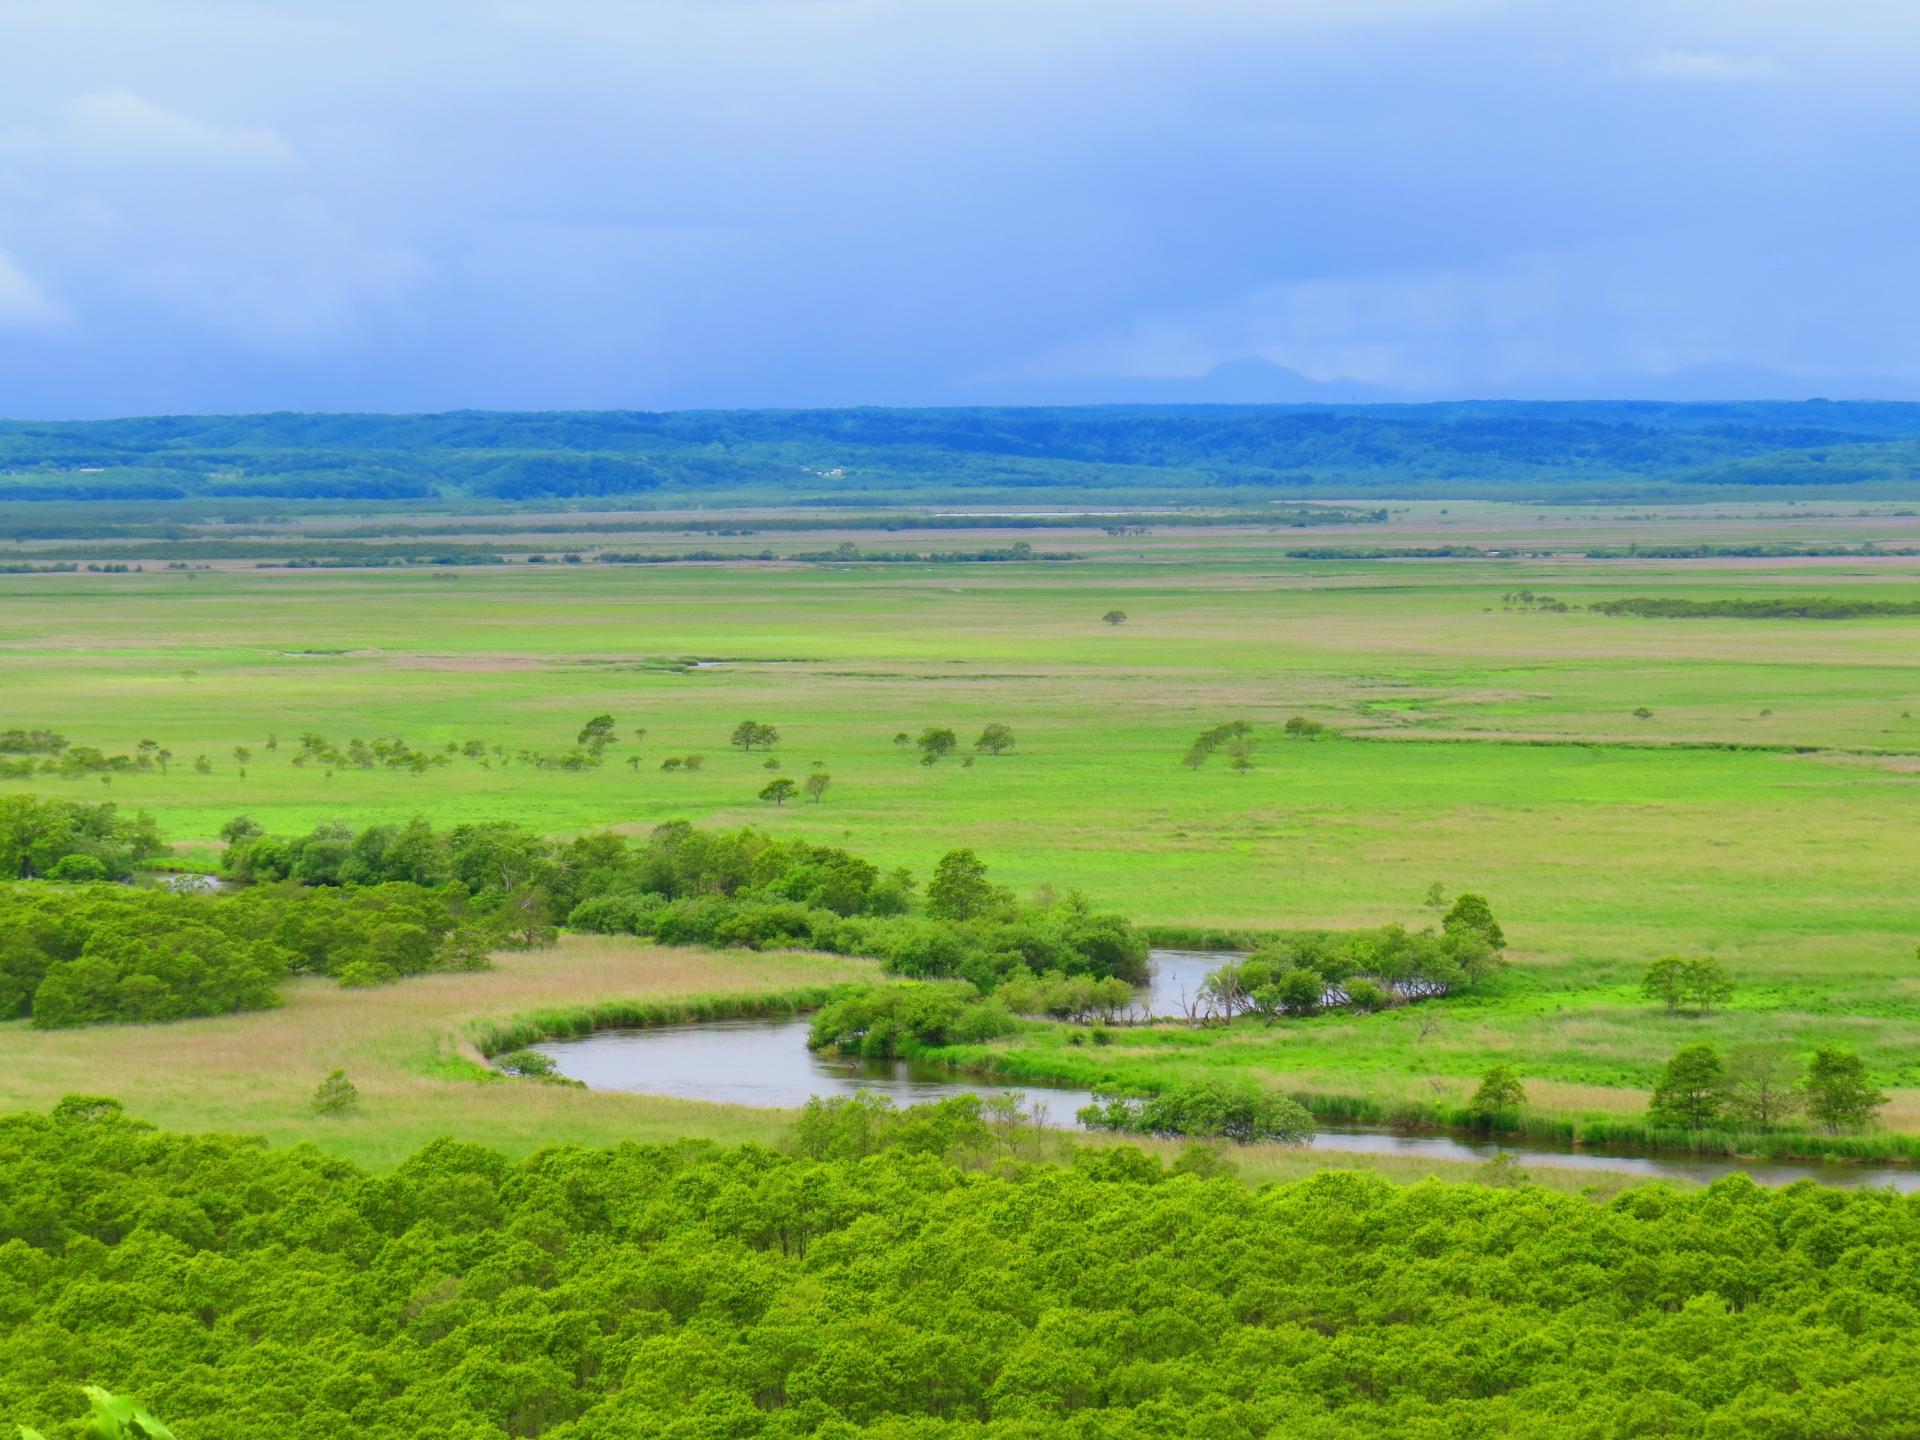 Kushiro Wetland: A Paradise for Shutterbugs and Greenthumbs